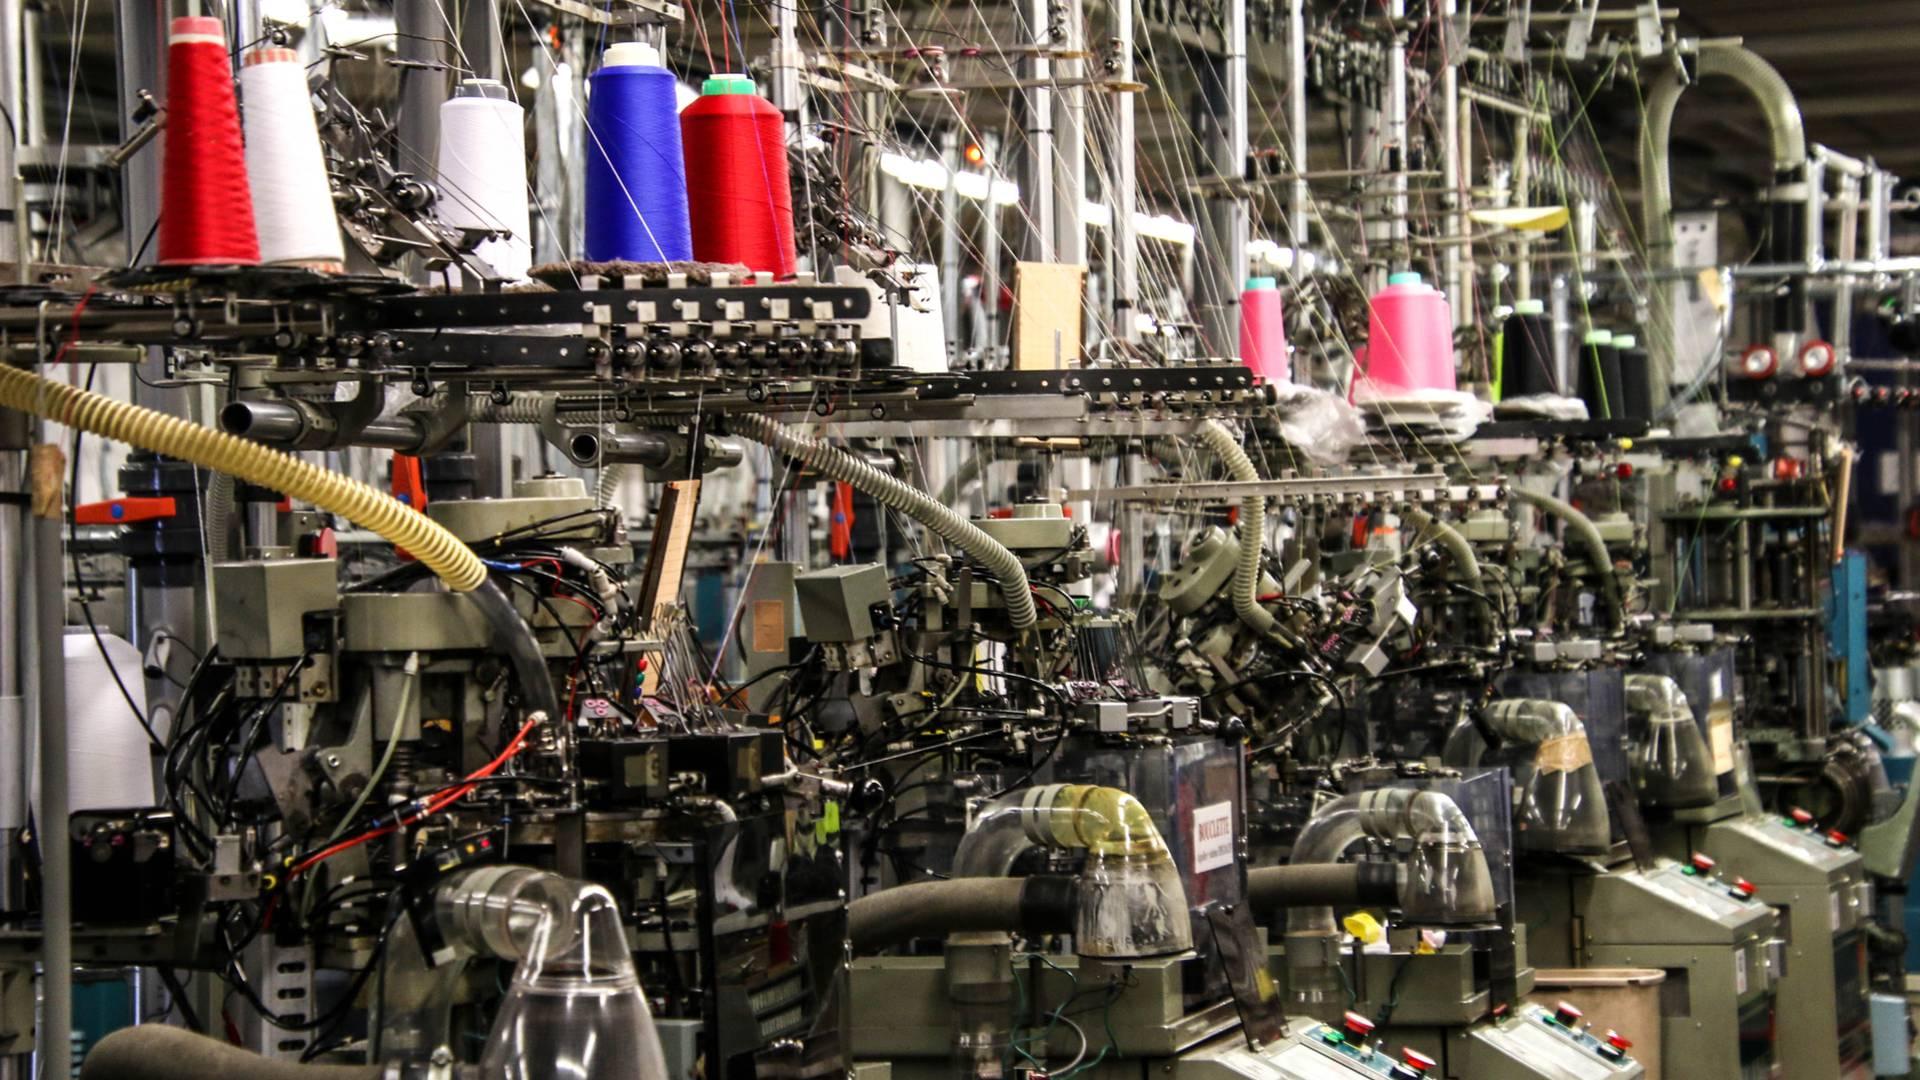 L'atelier de tricotage Perrin. © Lesley Williamson.